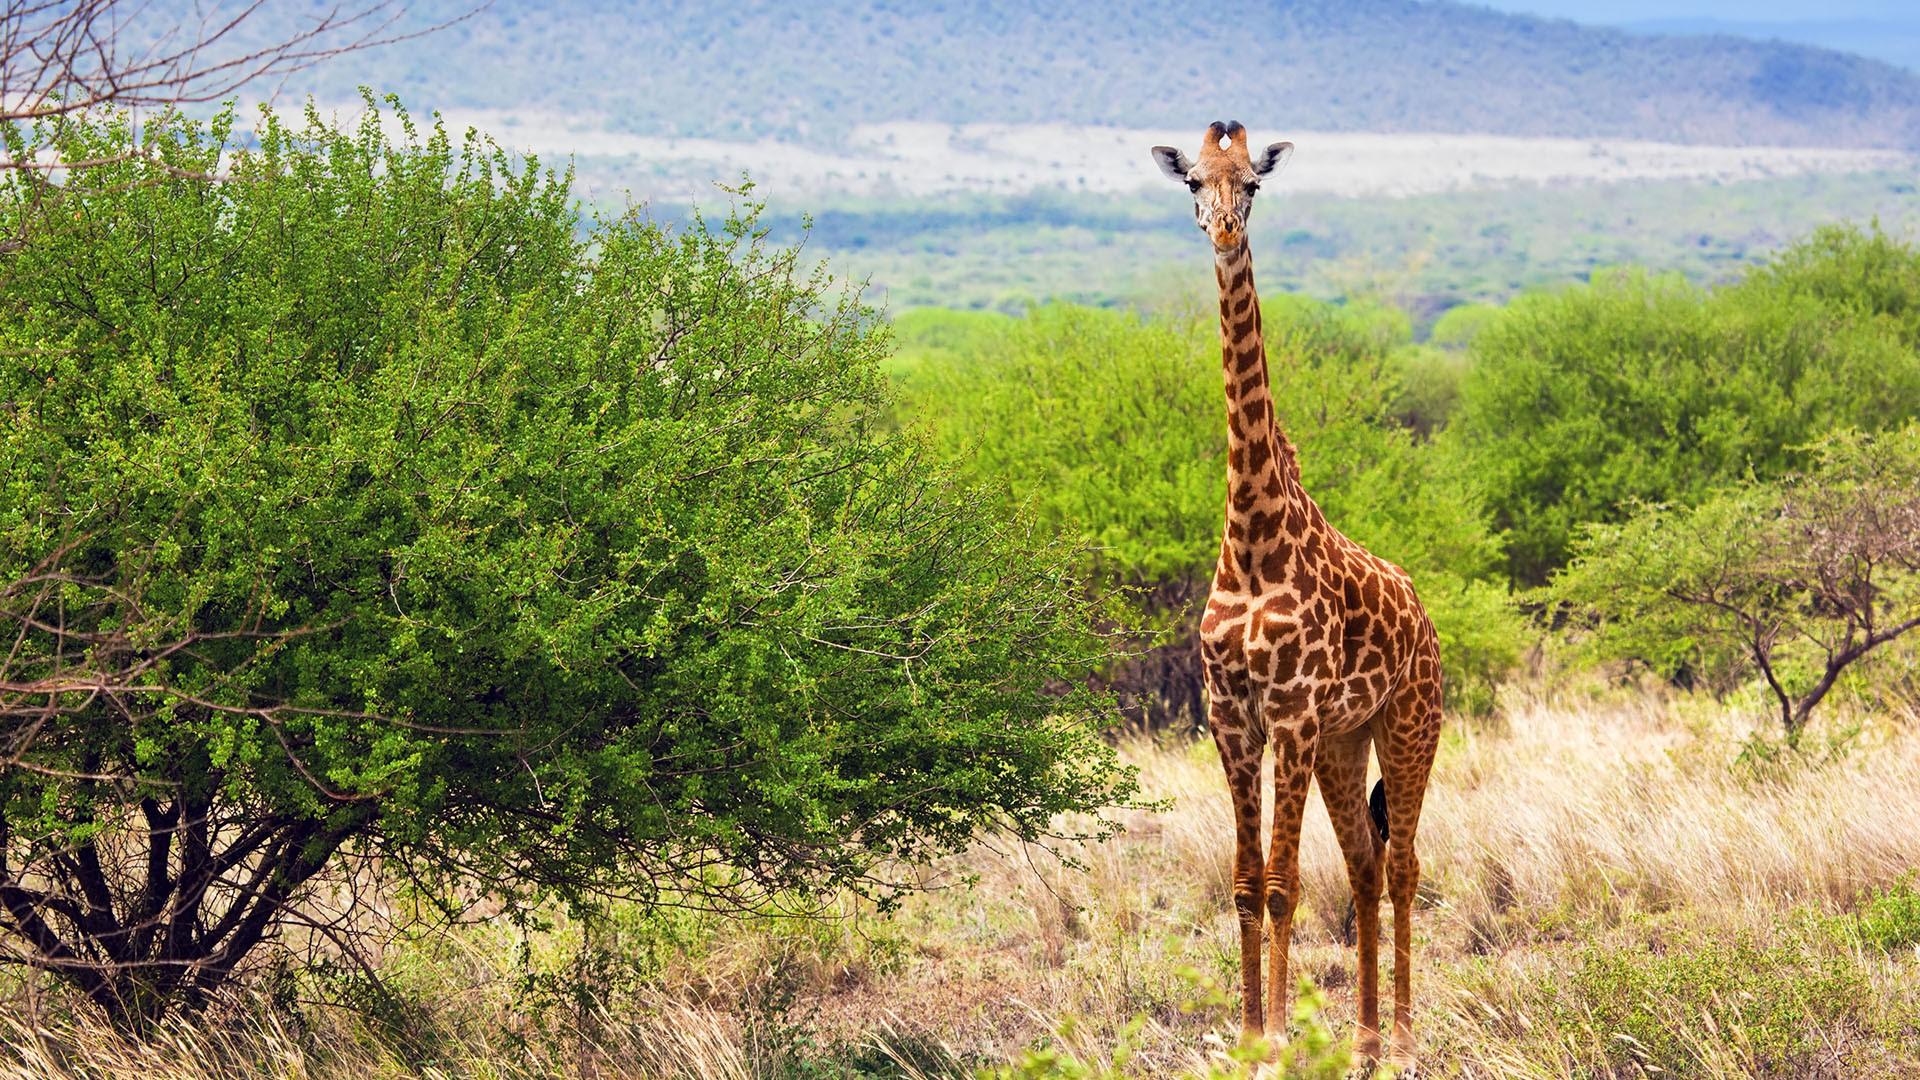 Giraffe On Grassland Savanna In Tsavo West National Park